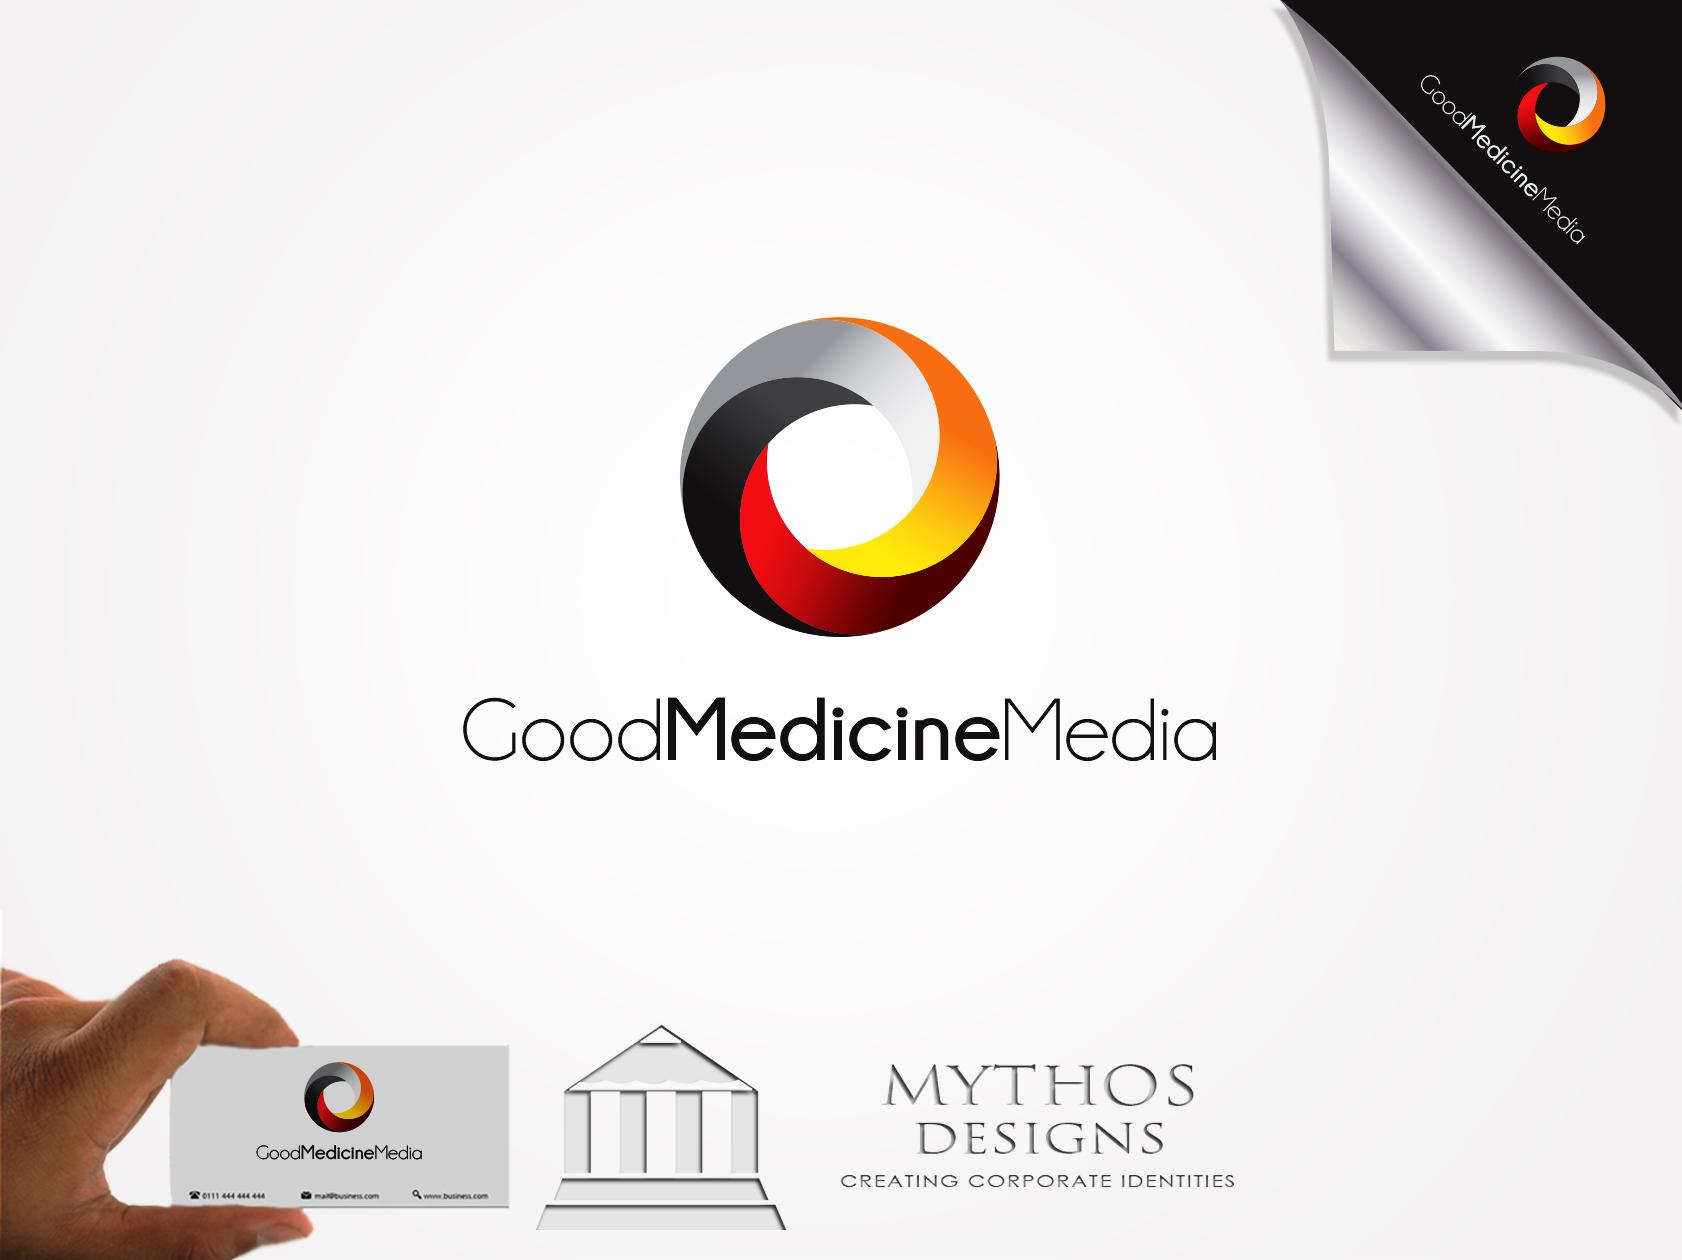 Logo Design by Mythos Designs - Entry No. 175 in the Logo Design Contest Good Medicine Media Logo Design.